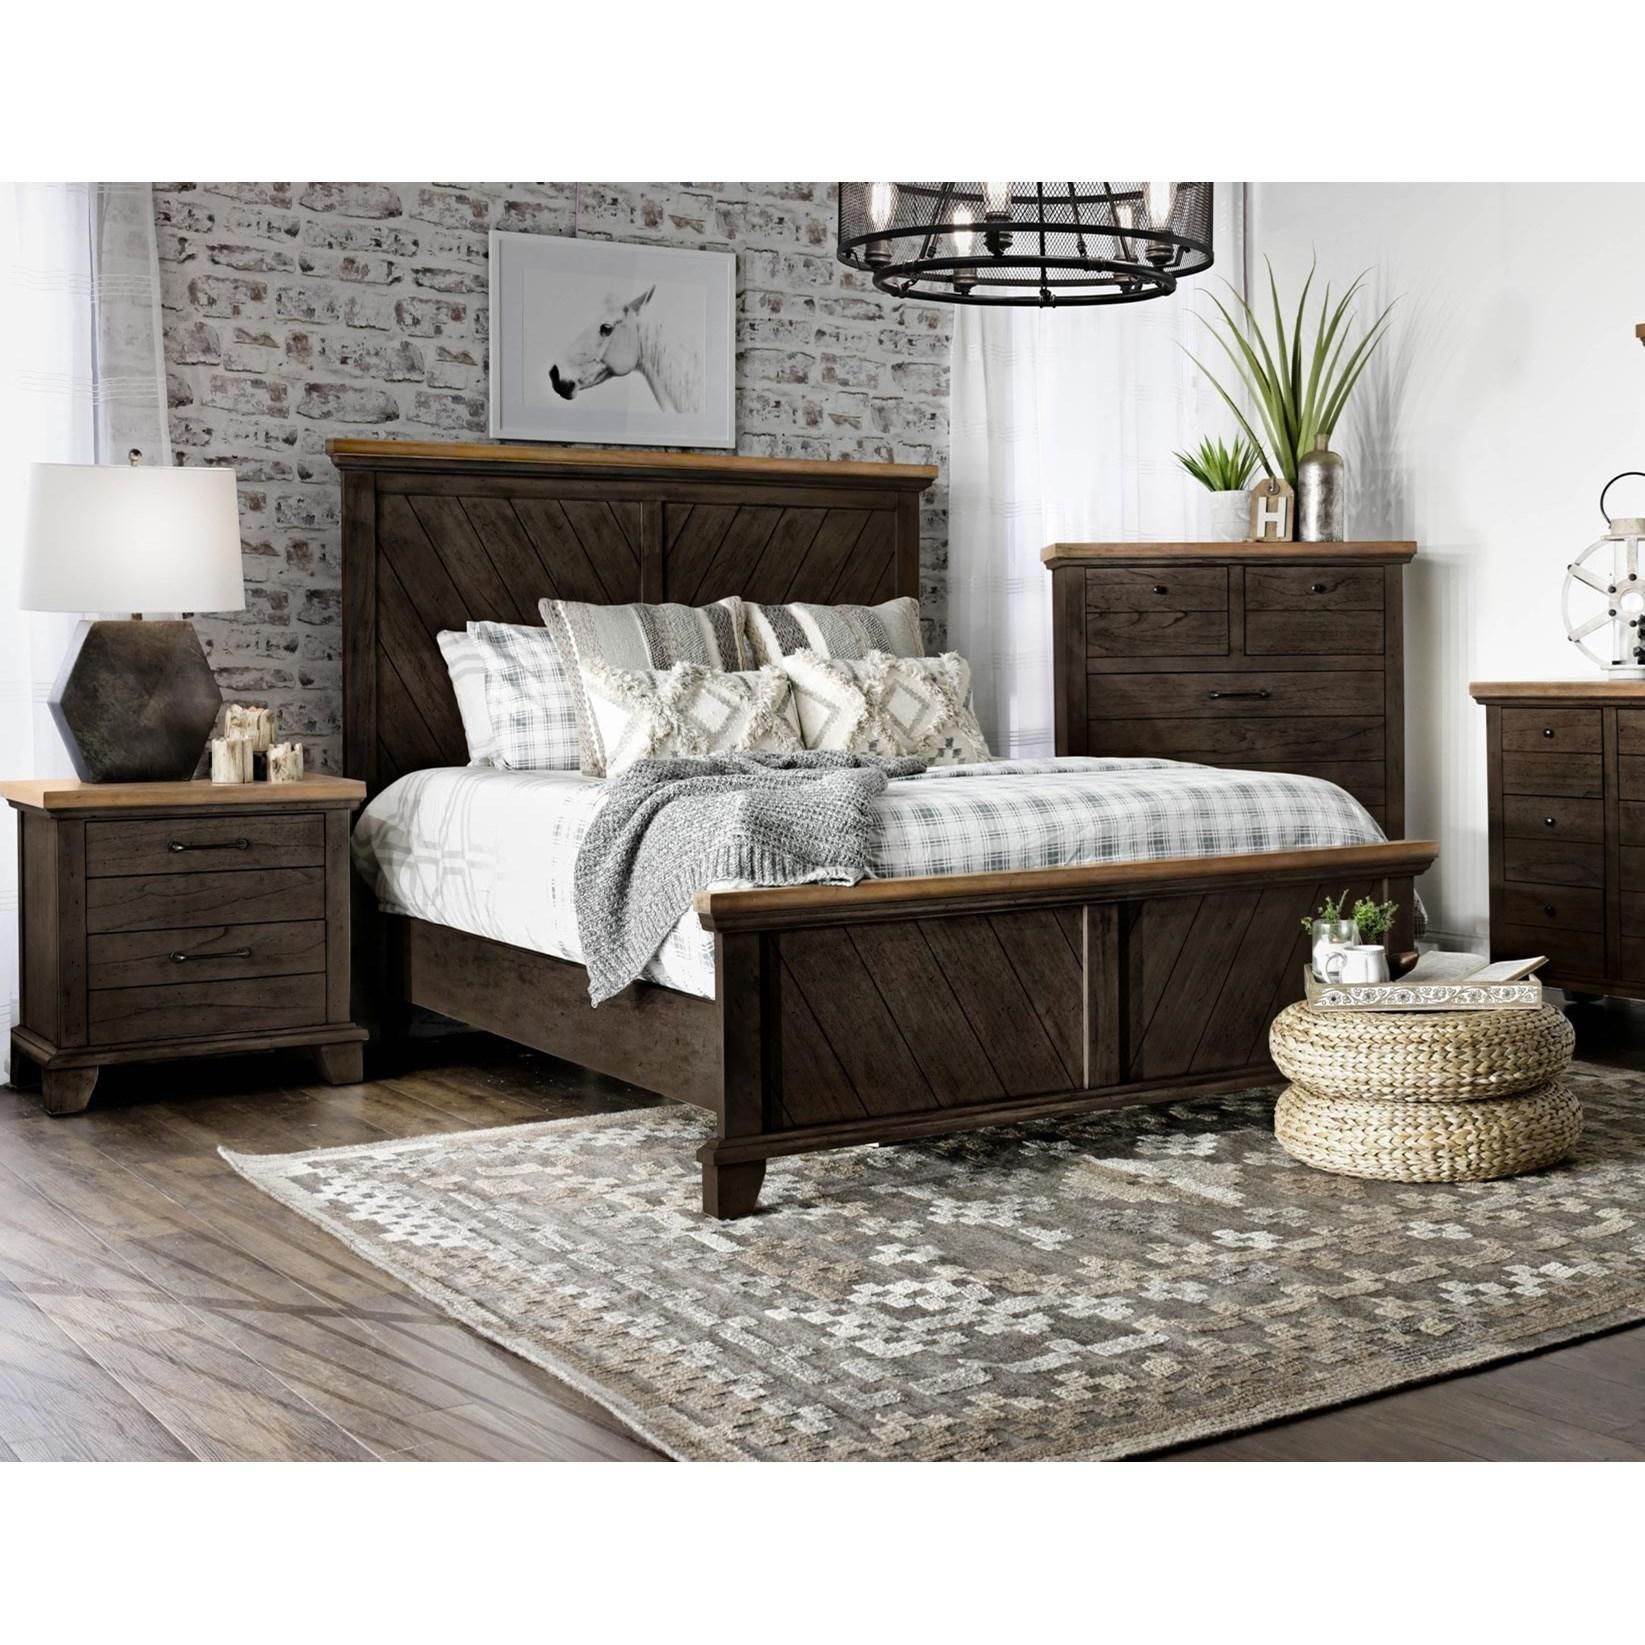 Bear Creek King Bedroom Group by Steve Silver at Standard Furniture